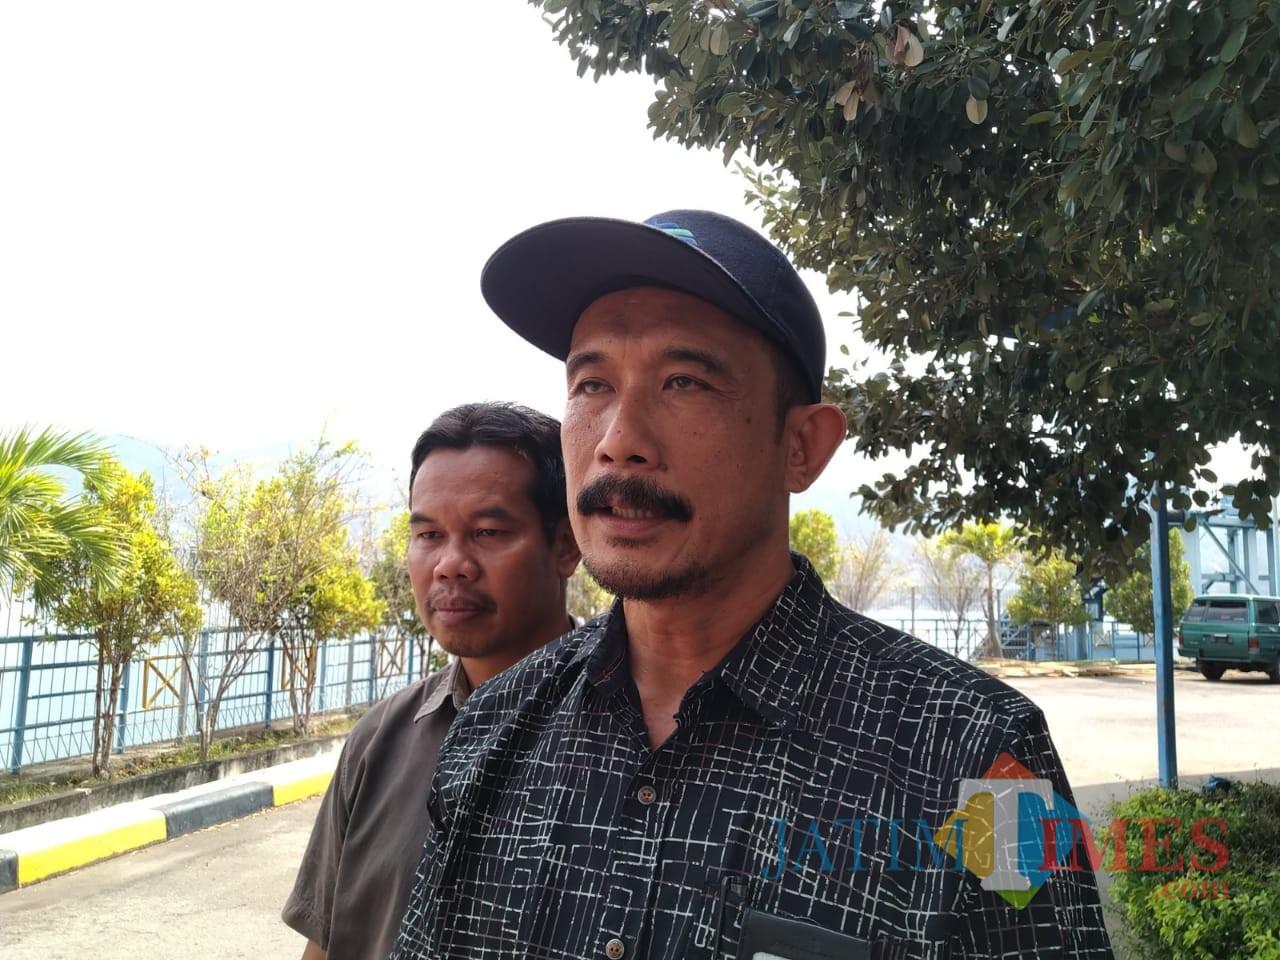 Kepala Sub-Divisi ASA 1/3 Jasa Tirta Hadi Witoyo (foto : Joko Pramono/Jatim Times)